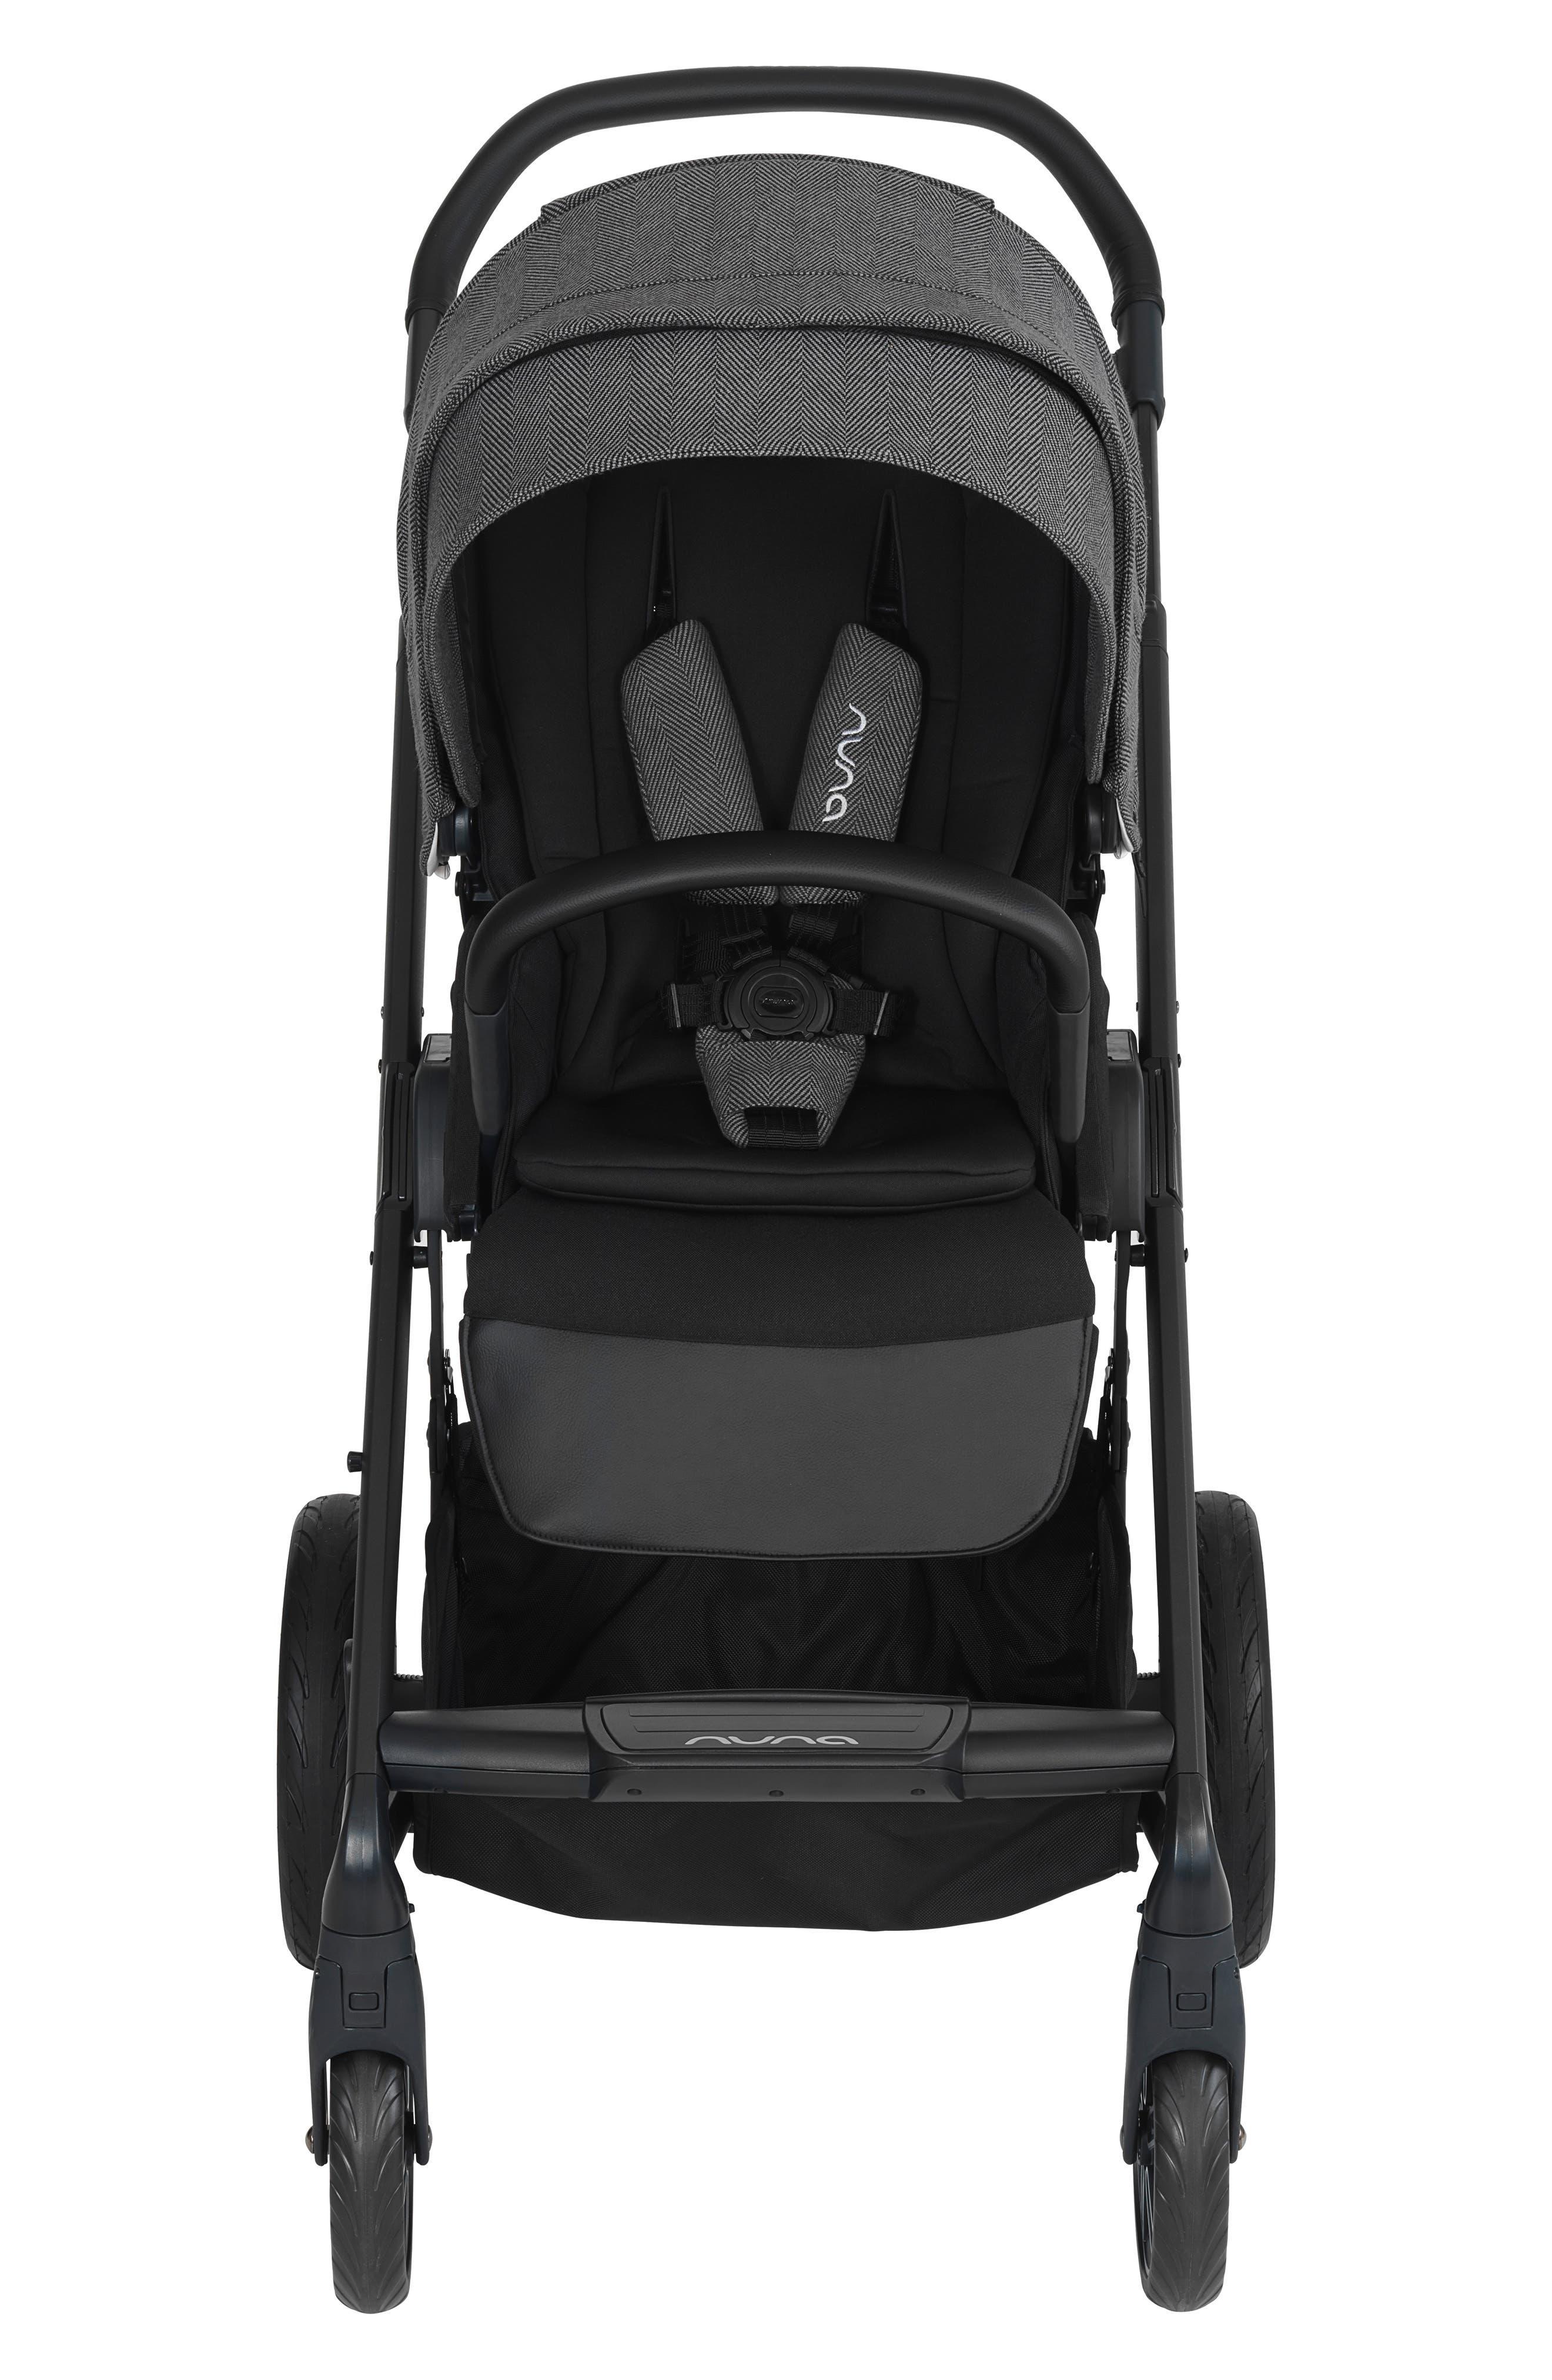 2019 MIXX<sup>™</sup> Stroller & PIPA<sup>™</sup> Lite LX Infant Car Seat Set Travel System,                             Alternate thumbnail 13, color,                             VERONA CAVIAR